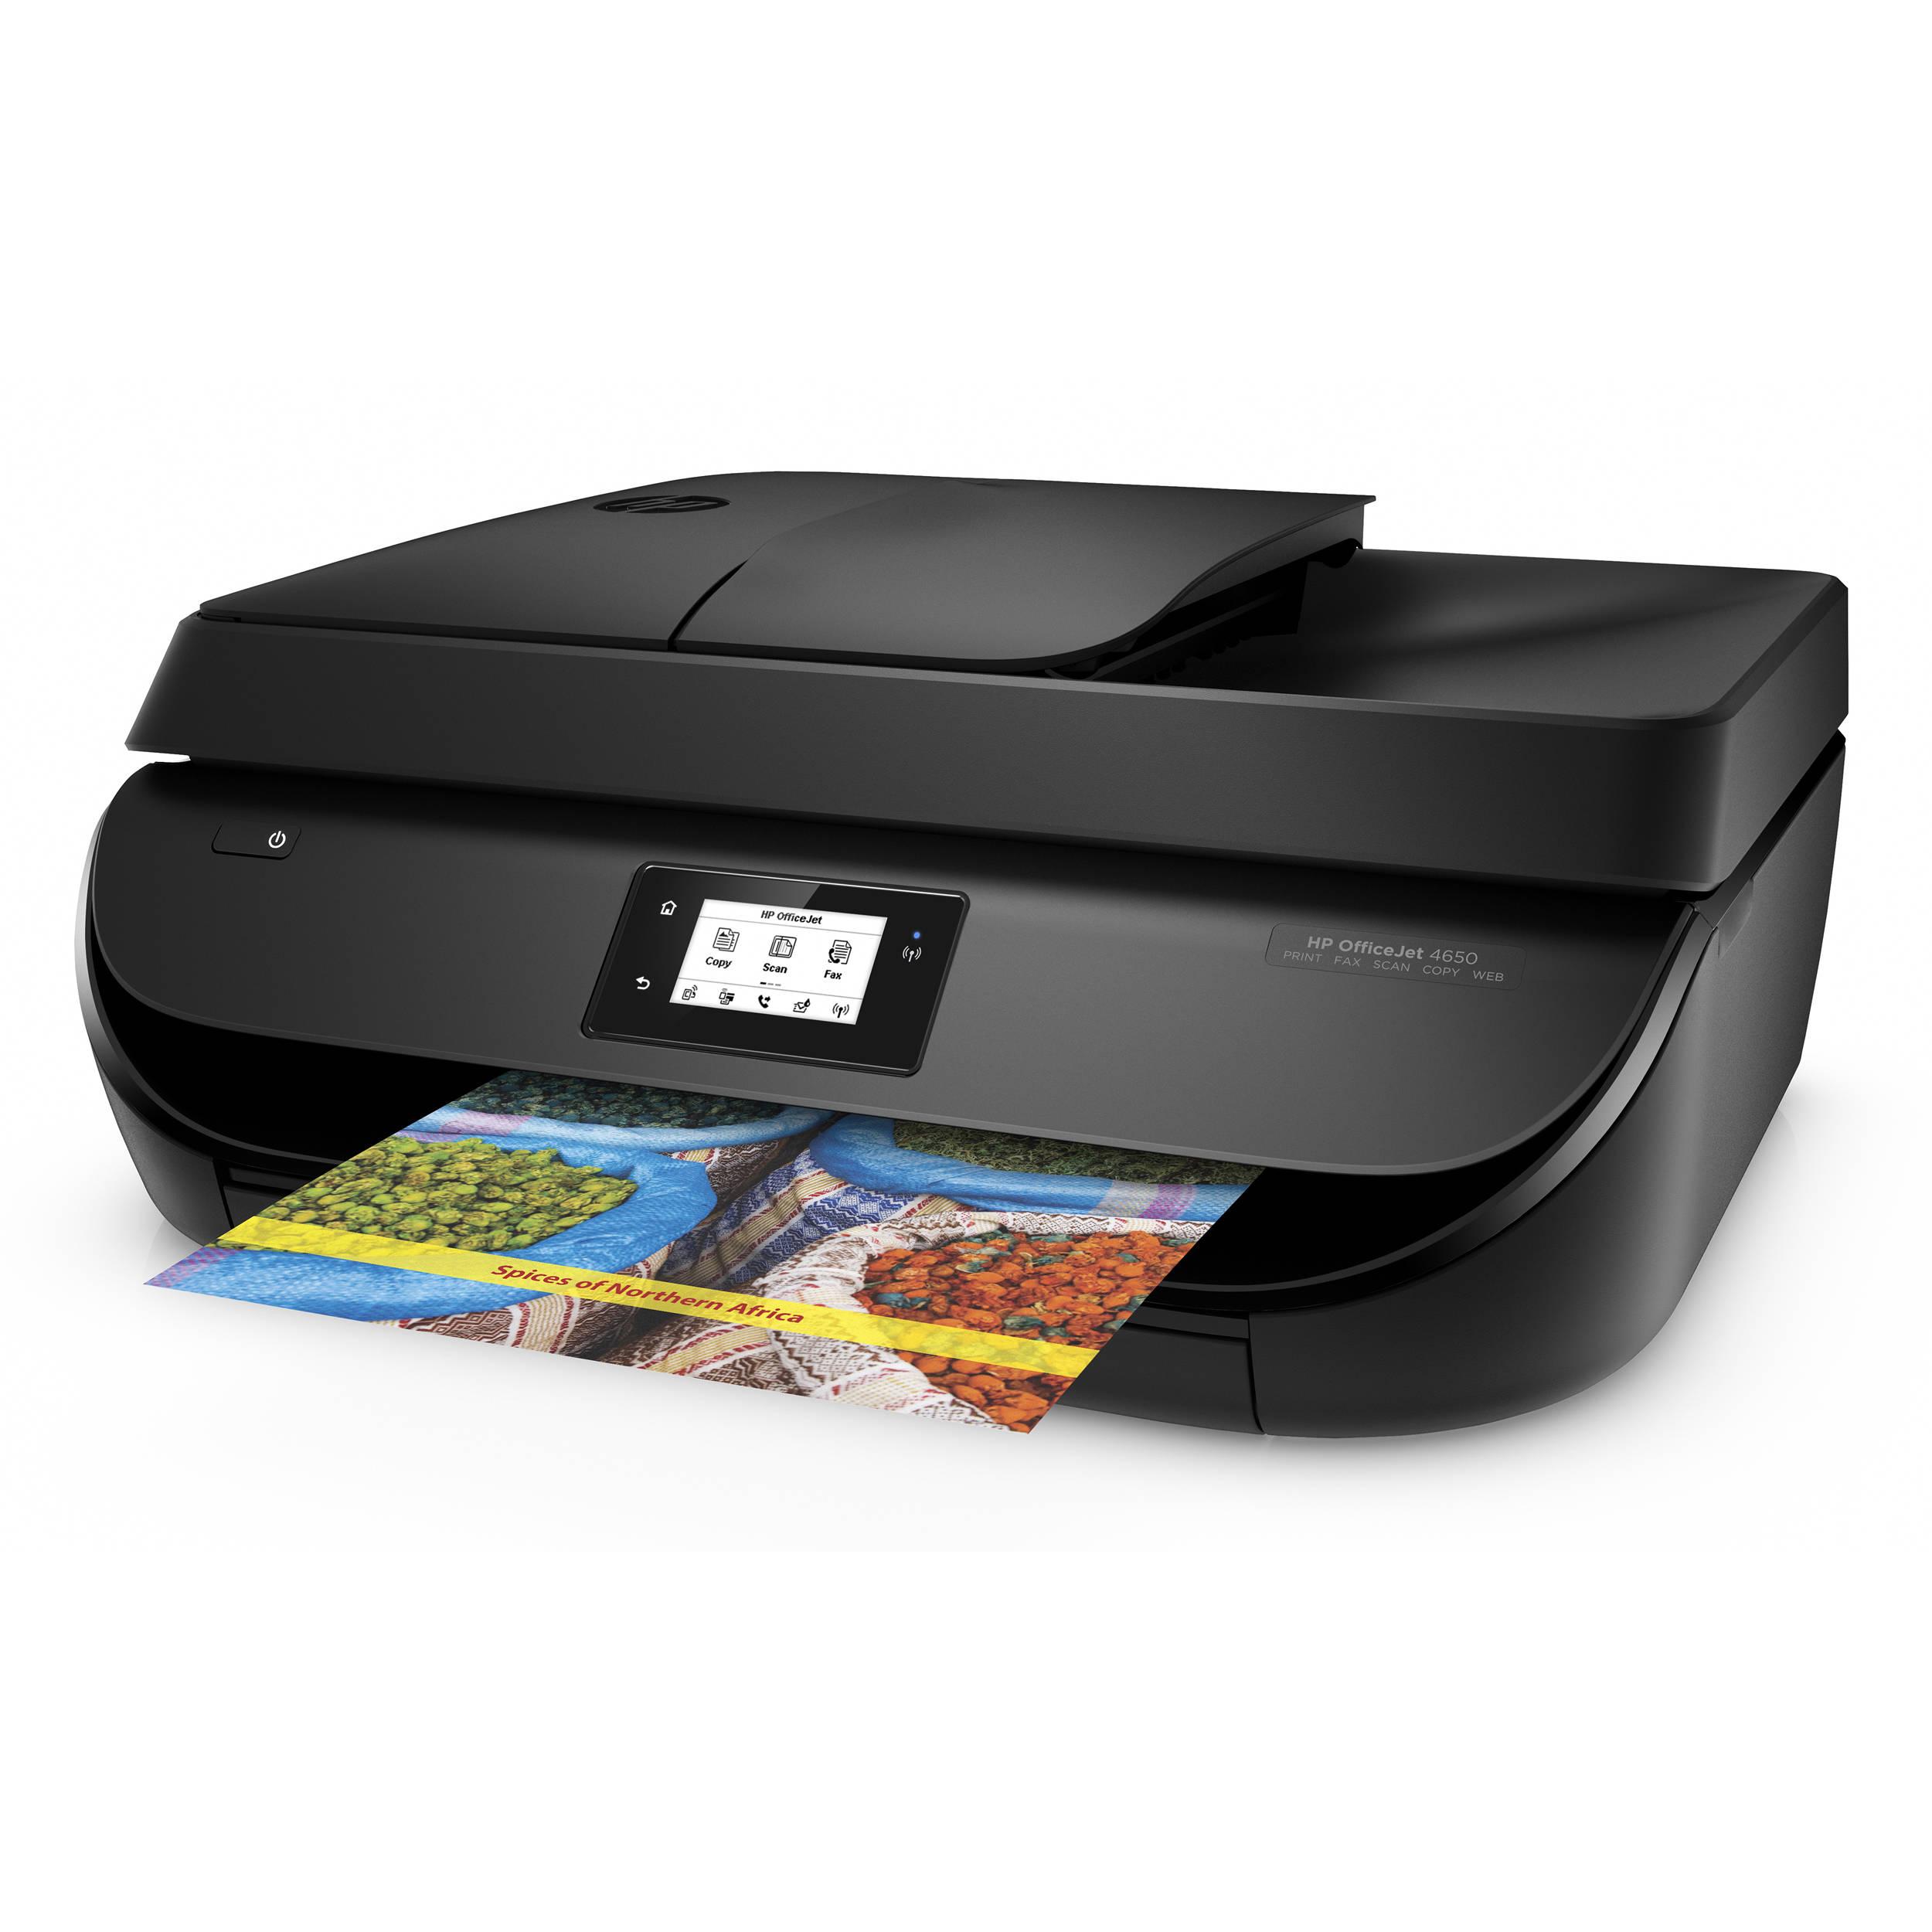 HP OfficeJet 4650 All-in-One Inkjet Printer F1J03A#B1H B&H ...